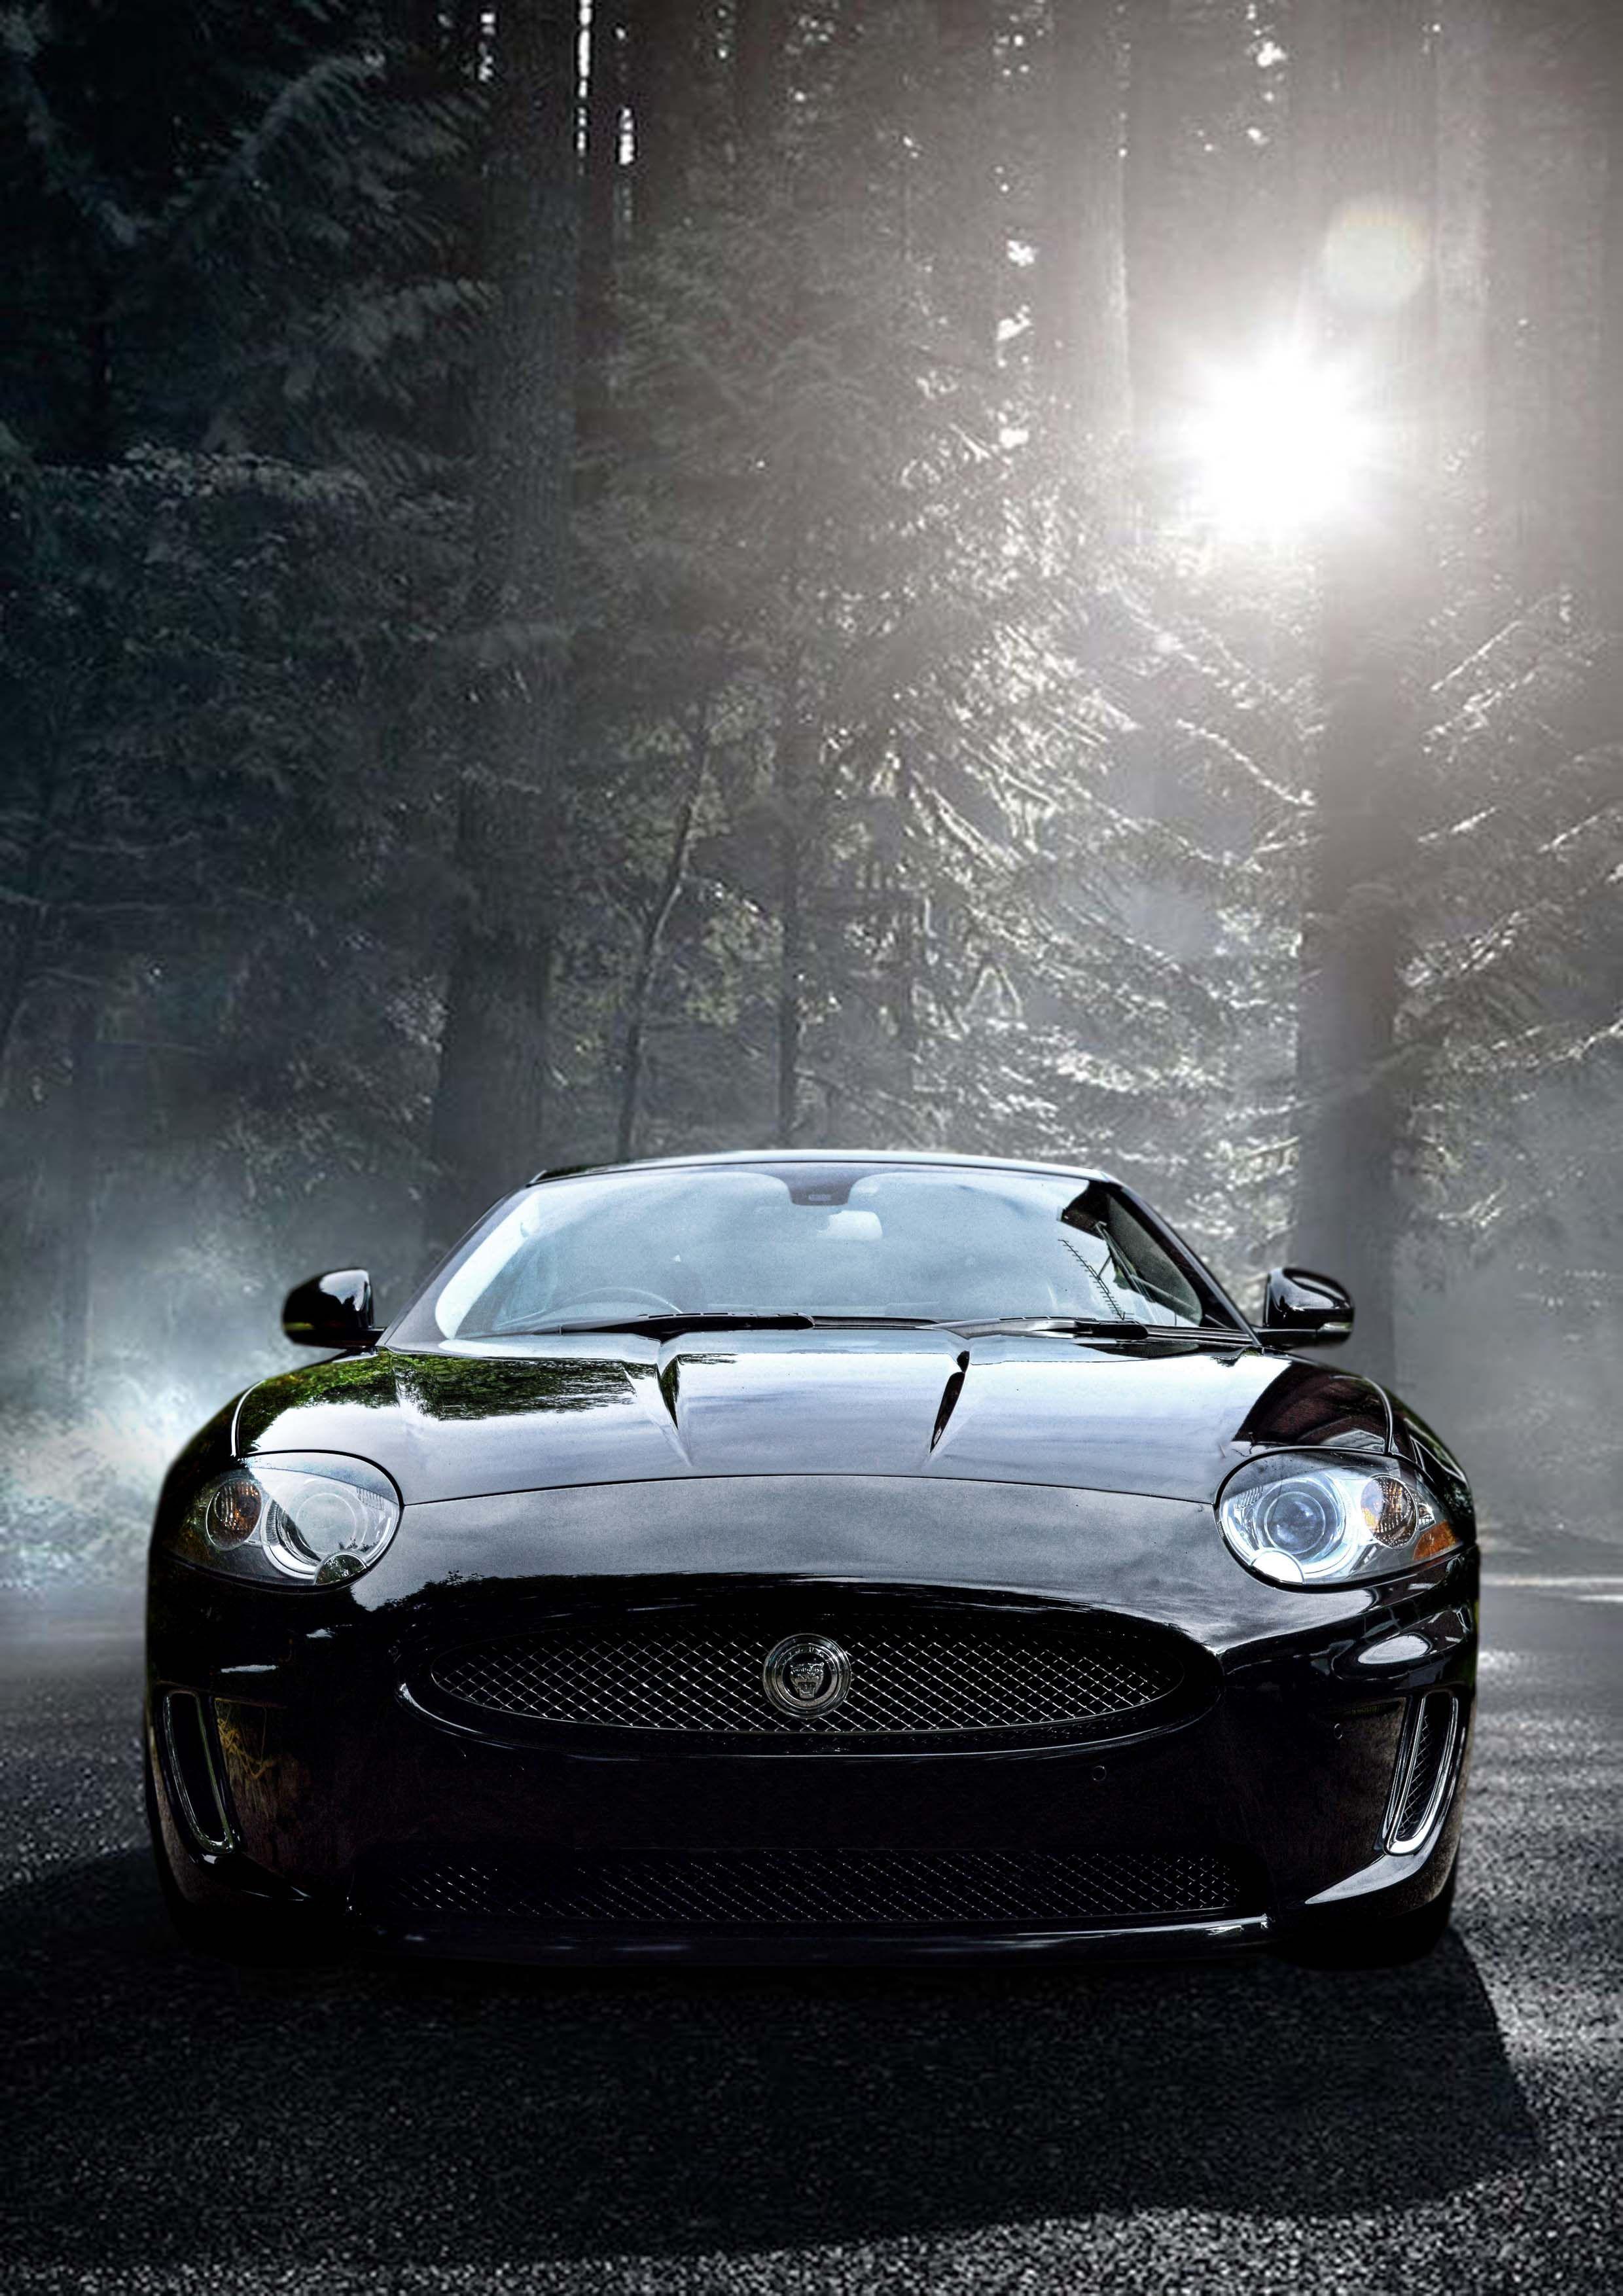 coupe jaguar cars drophead restored xk lti sale inventory fully e for